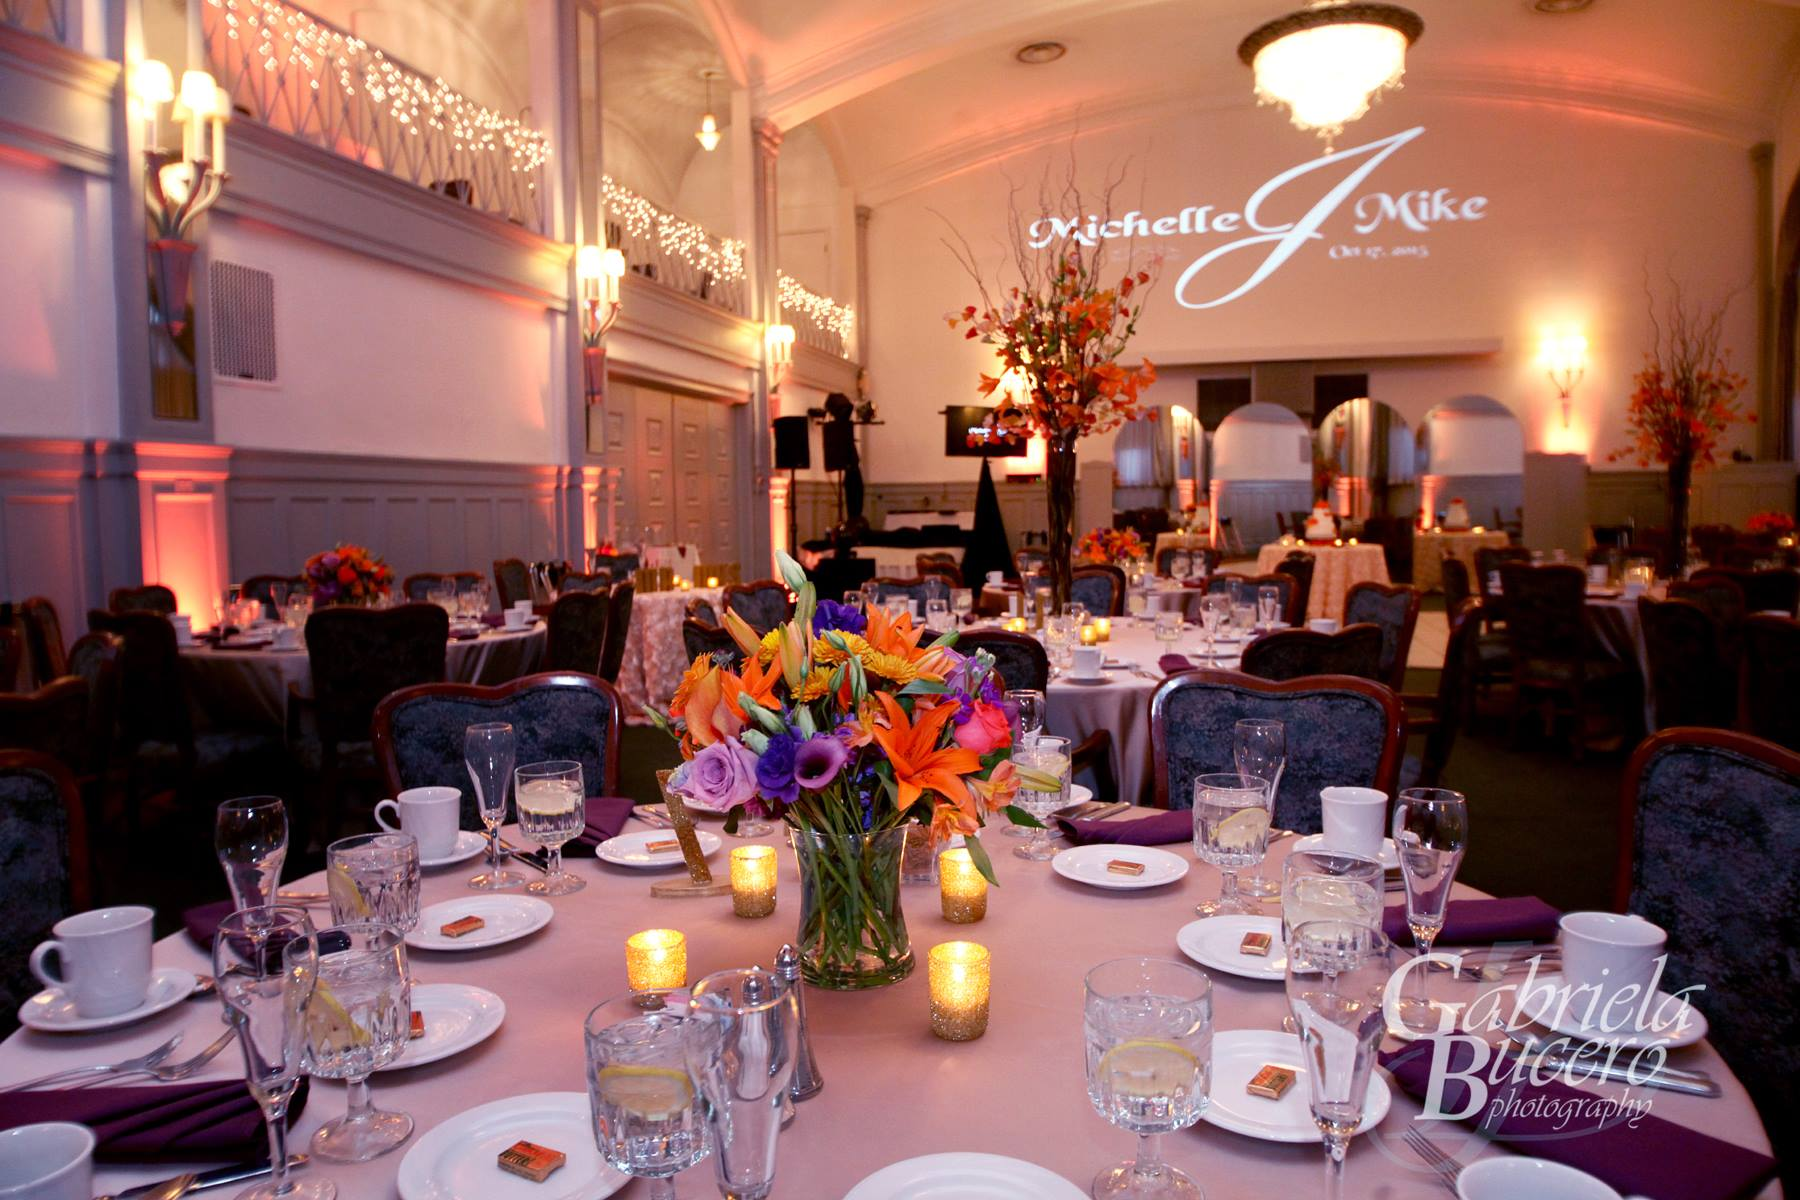 Binghamton NY mobile wedding DJ